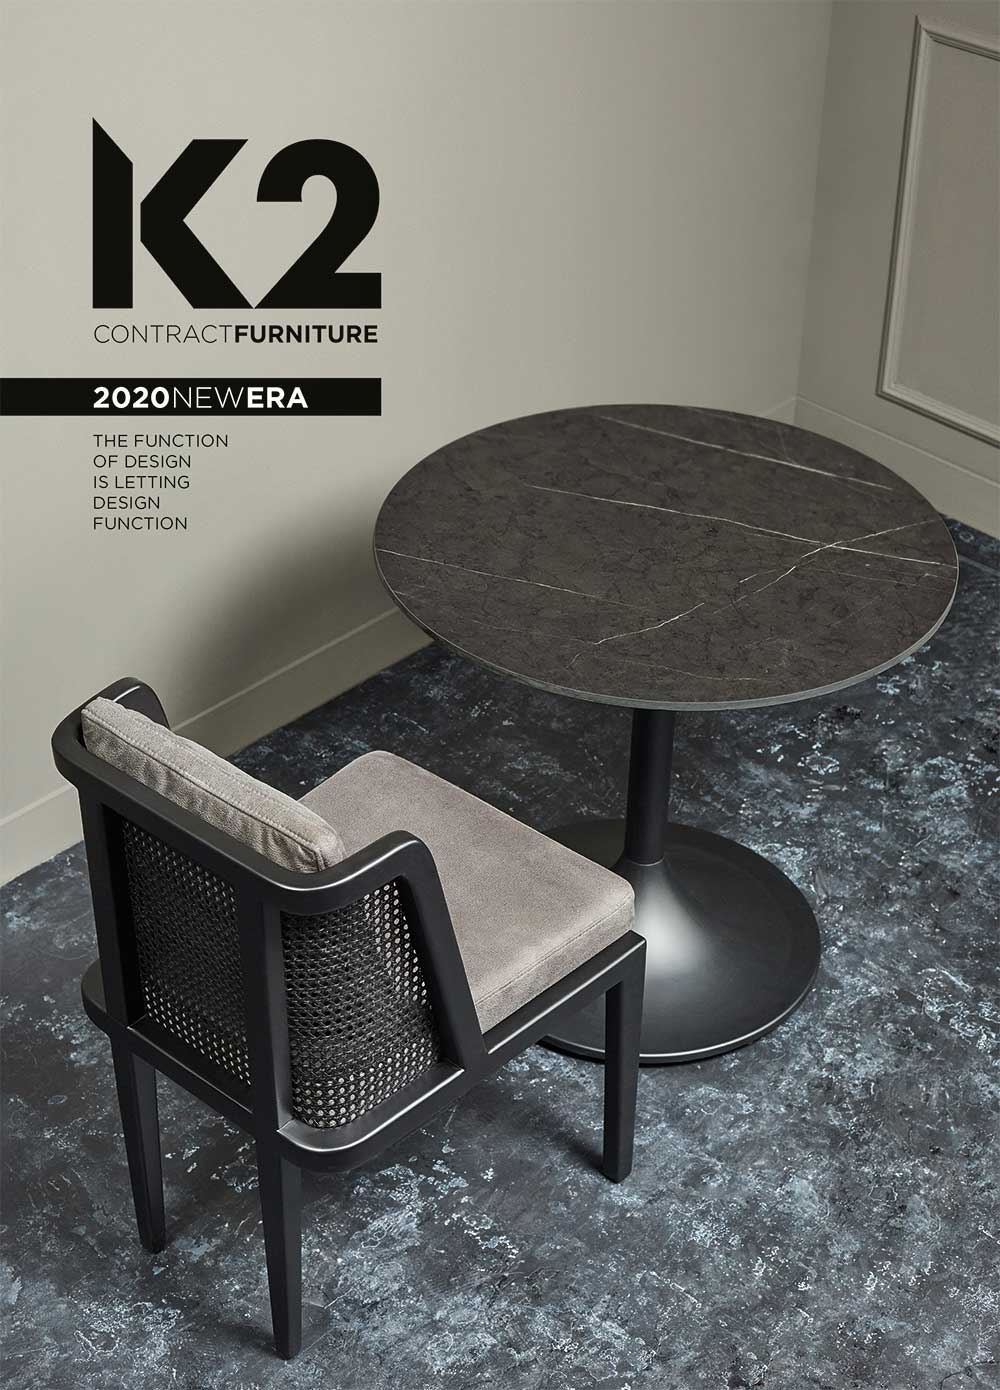 Contract Furniture Catalogs K2furniture Gr